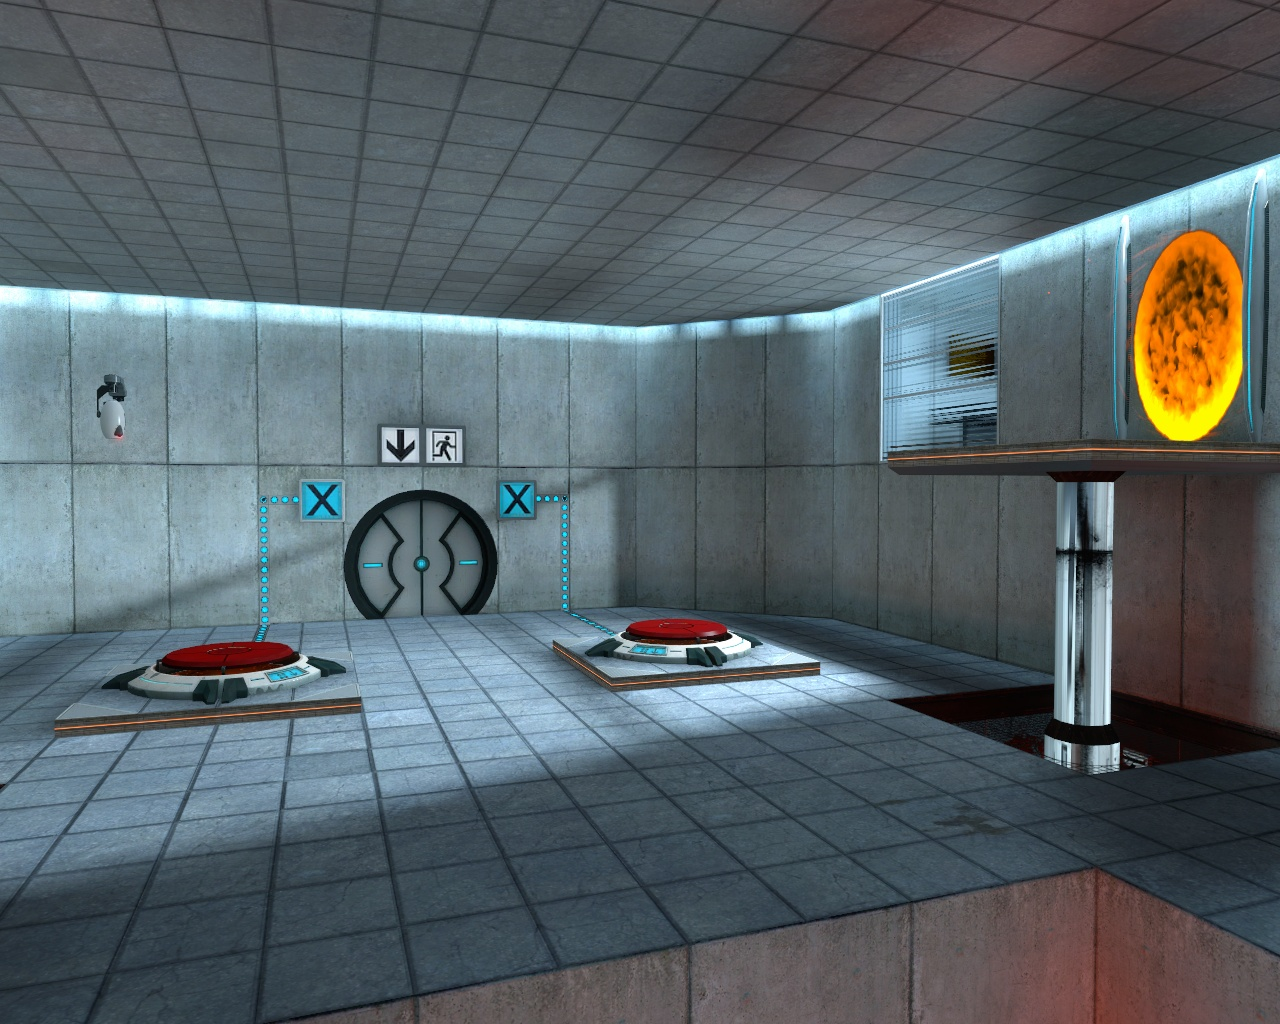 Portal-Test5.jpg